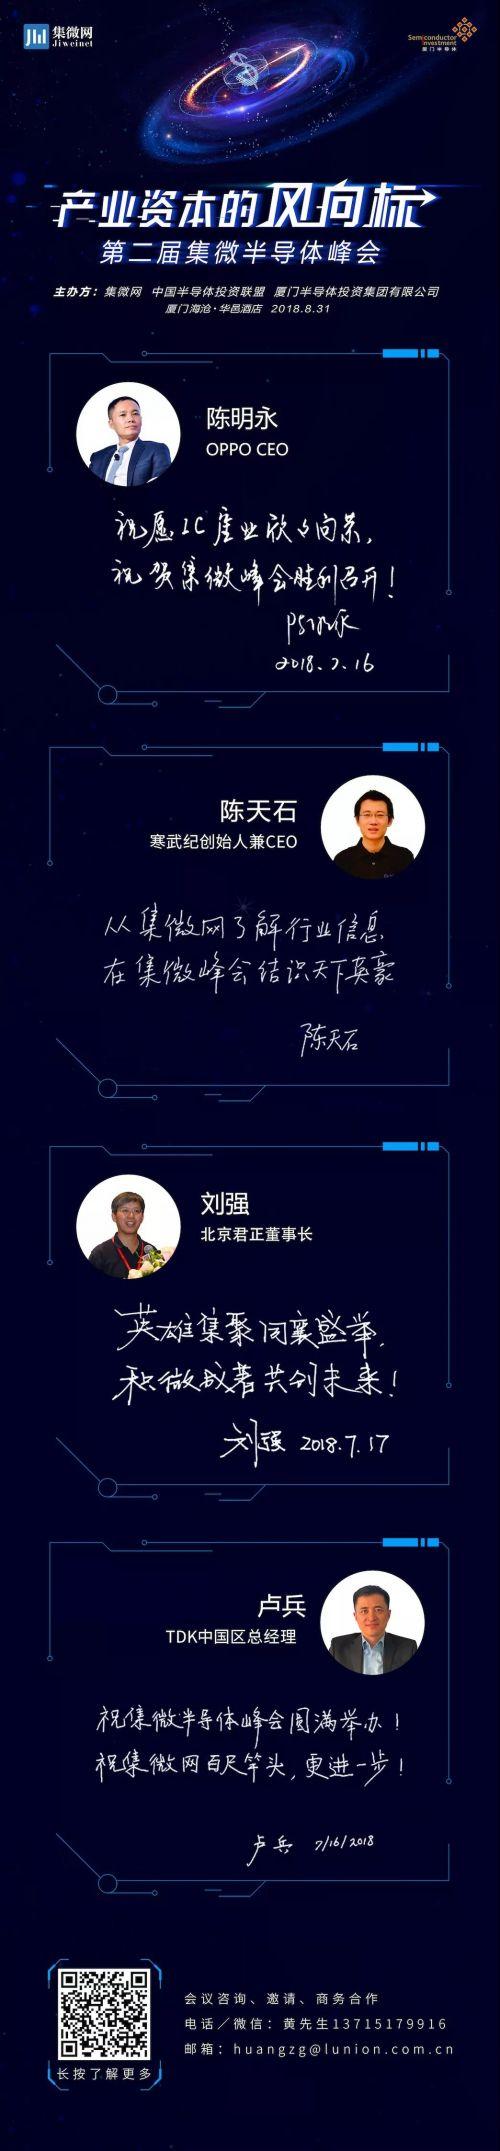 Arm吴雄昂、黄汪、石磊、张世龙、林永育寄语峰会12